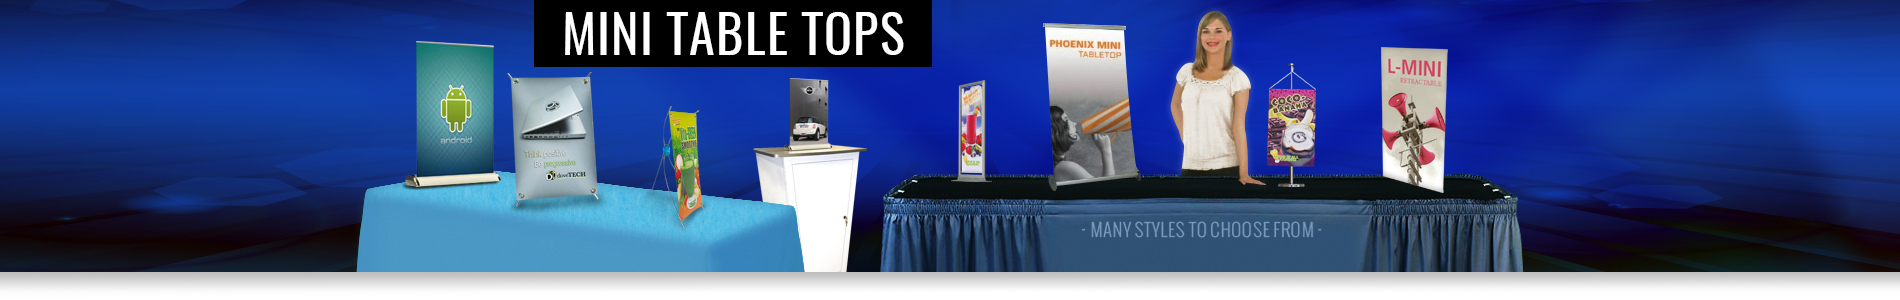 Mini Table Top Displays